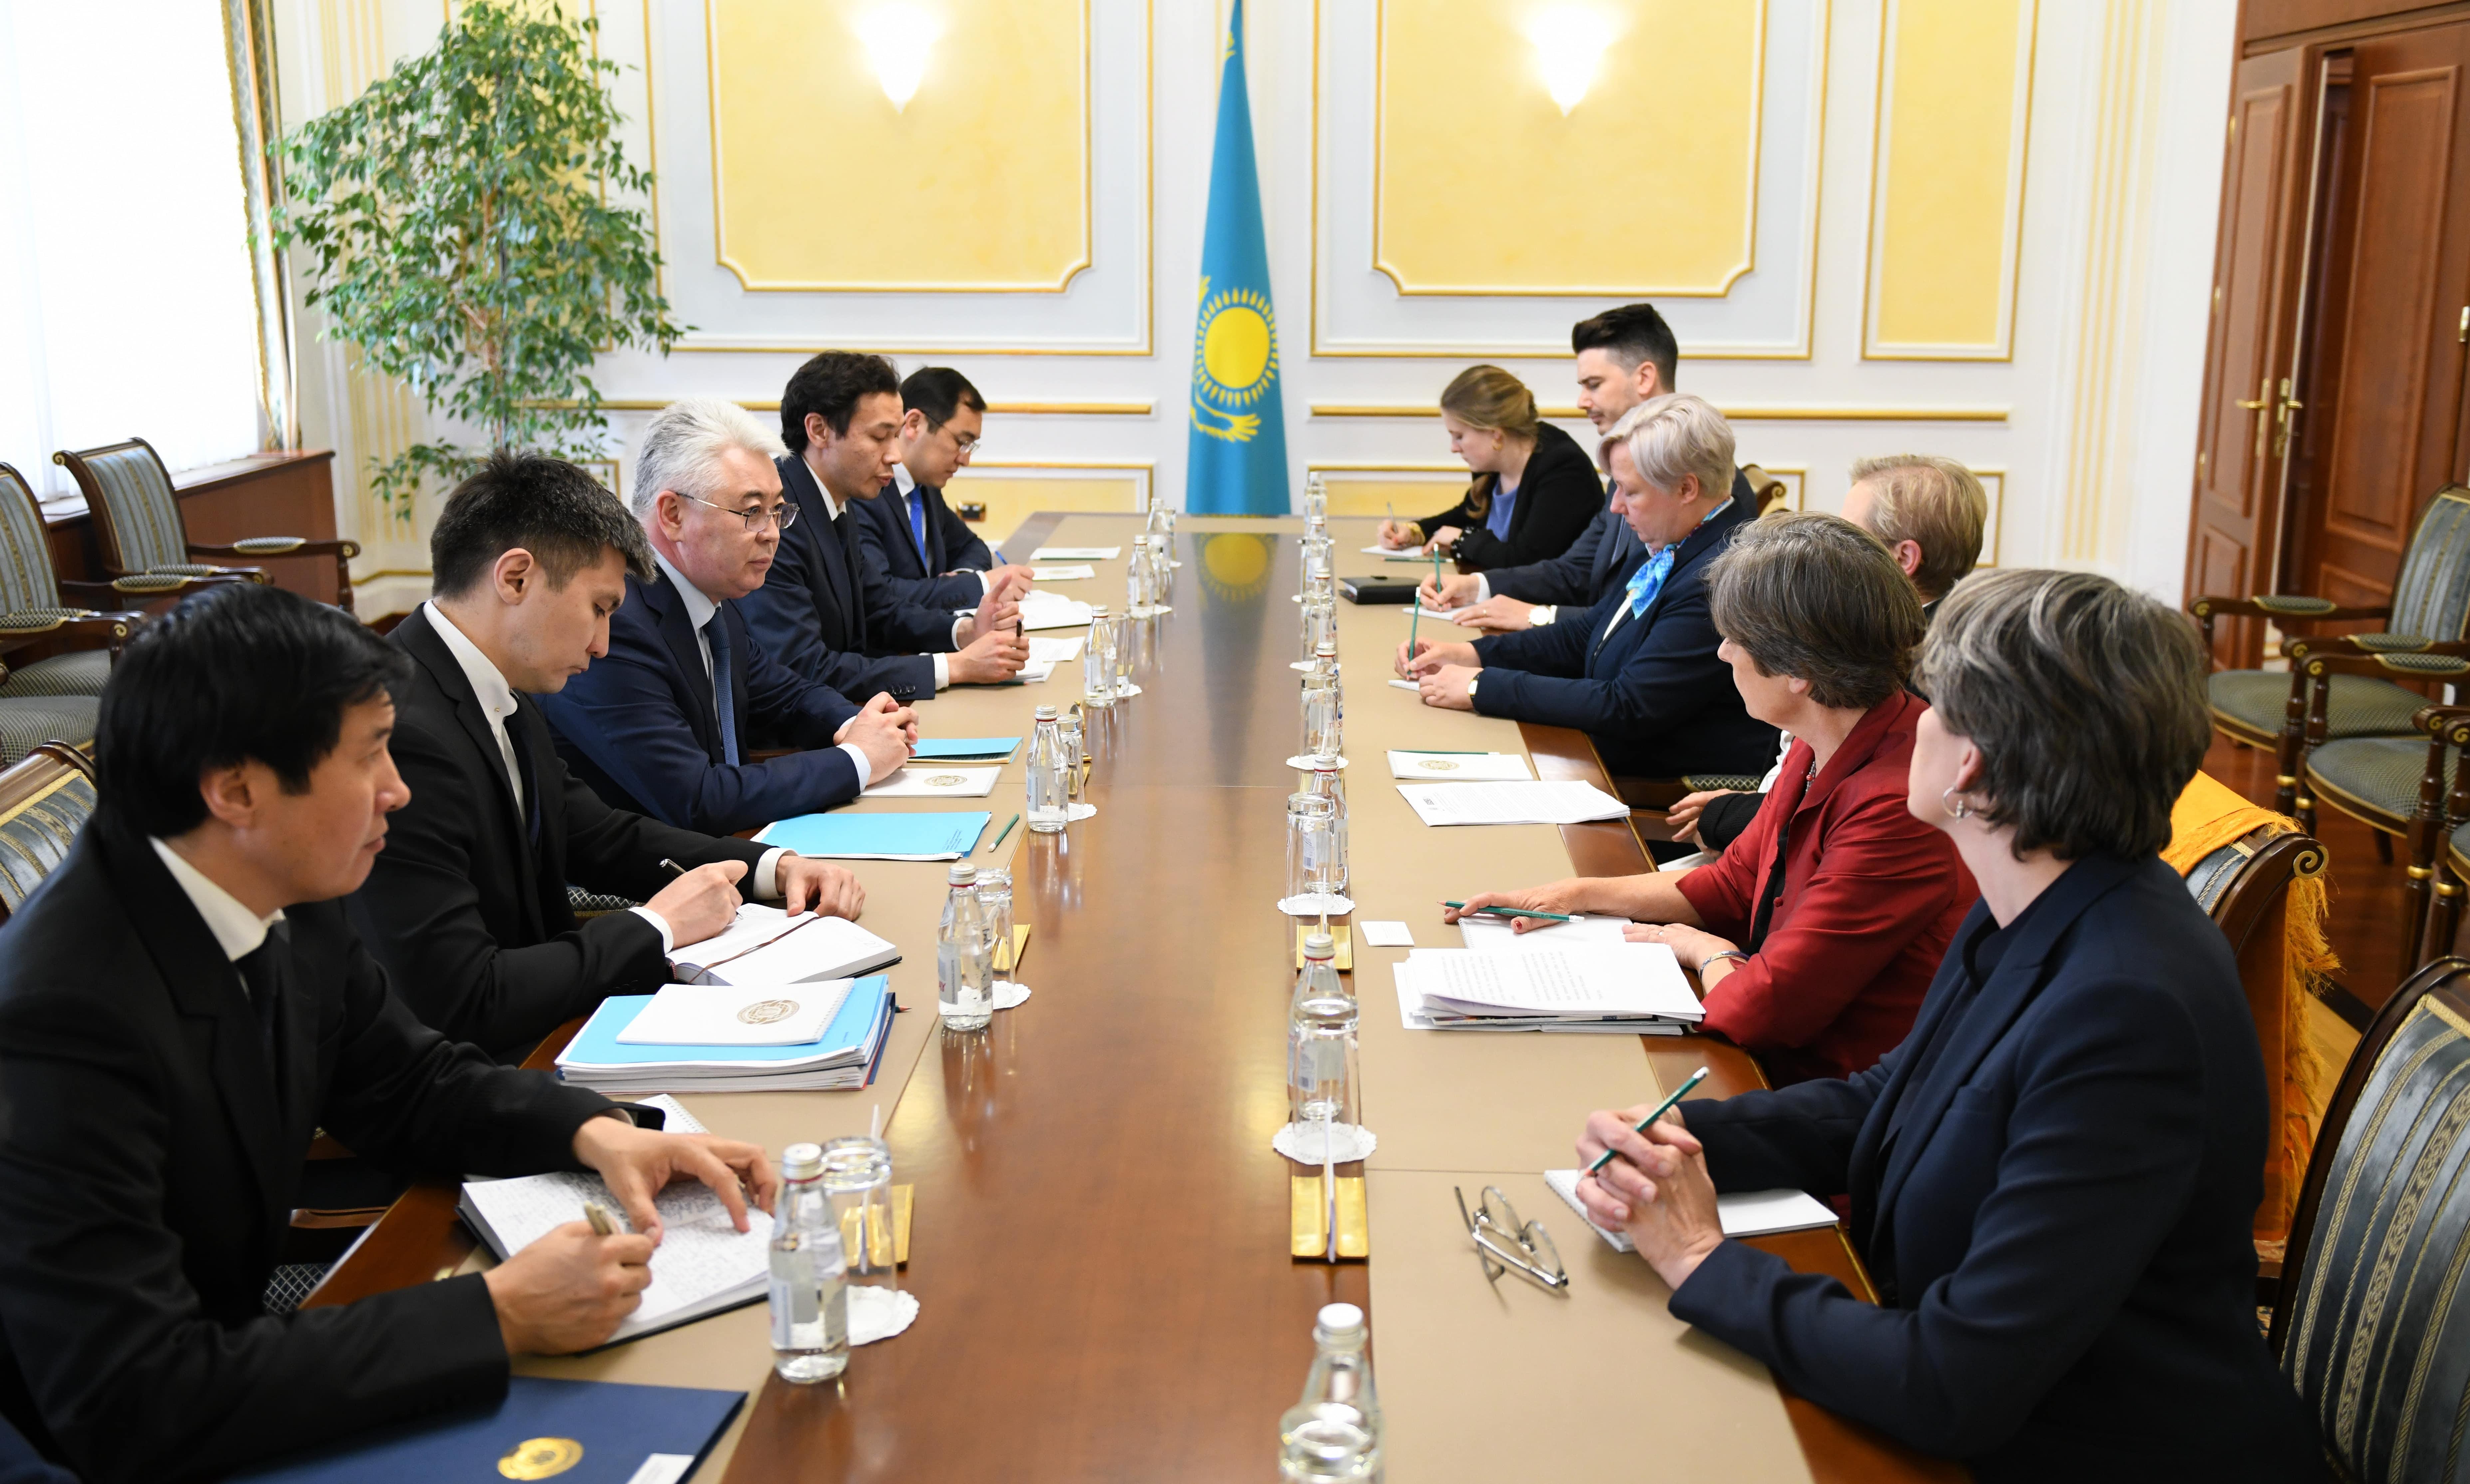 Предвыборная кампания в Казахстане была проведена практически без нарушений – глава БДИПЧ ОБСЕ